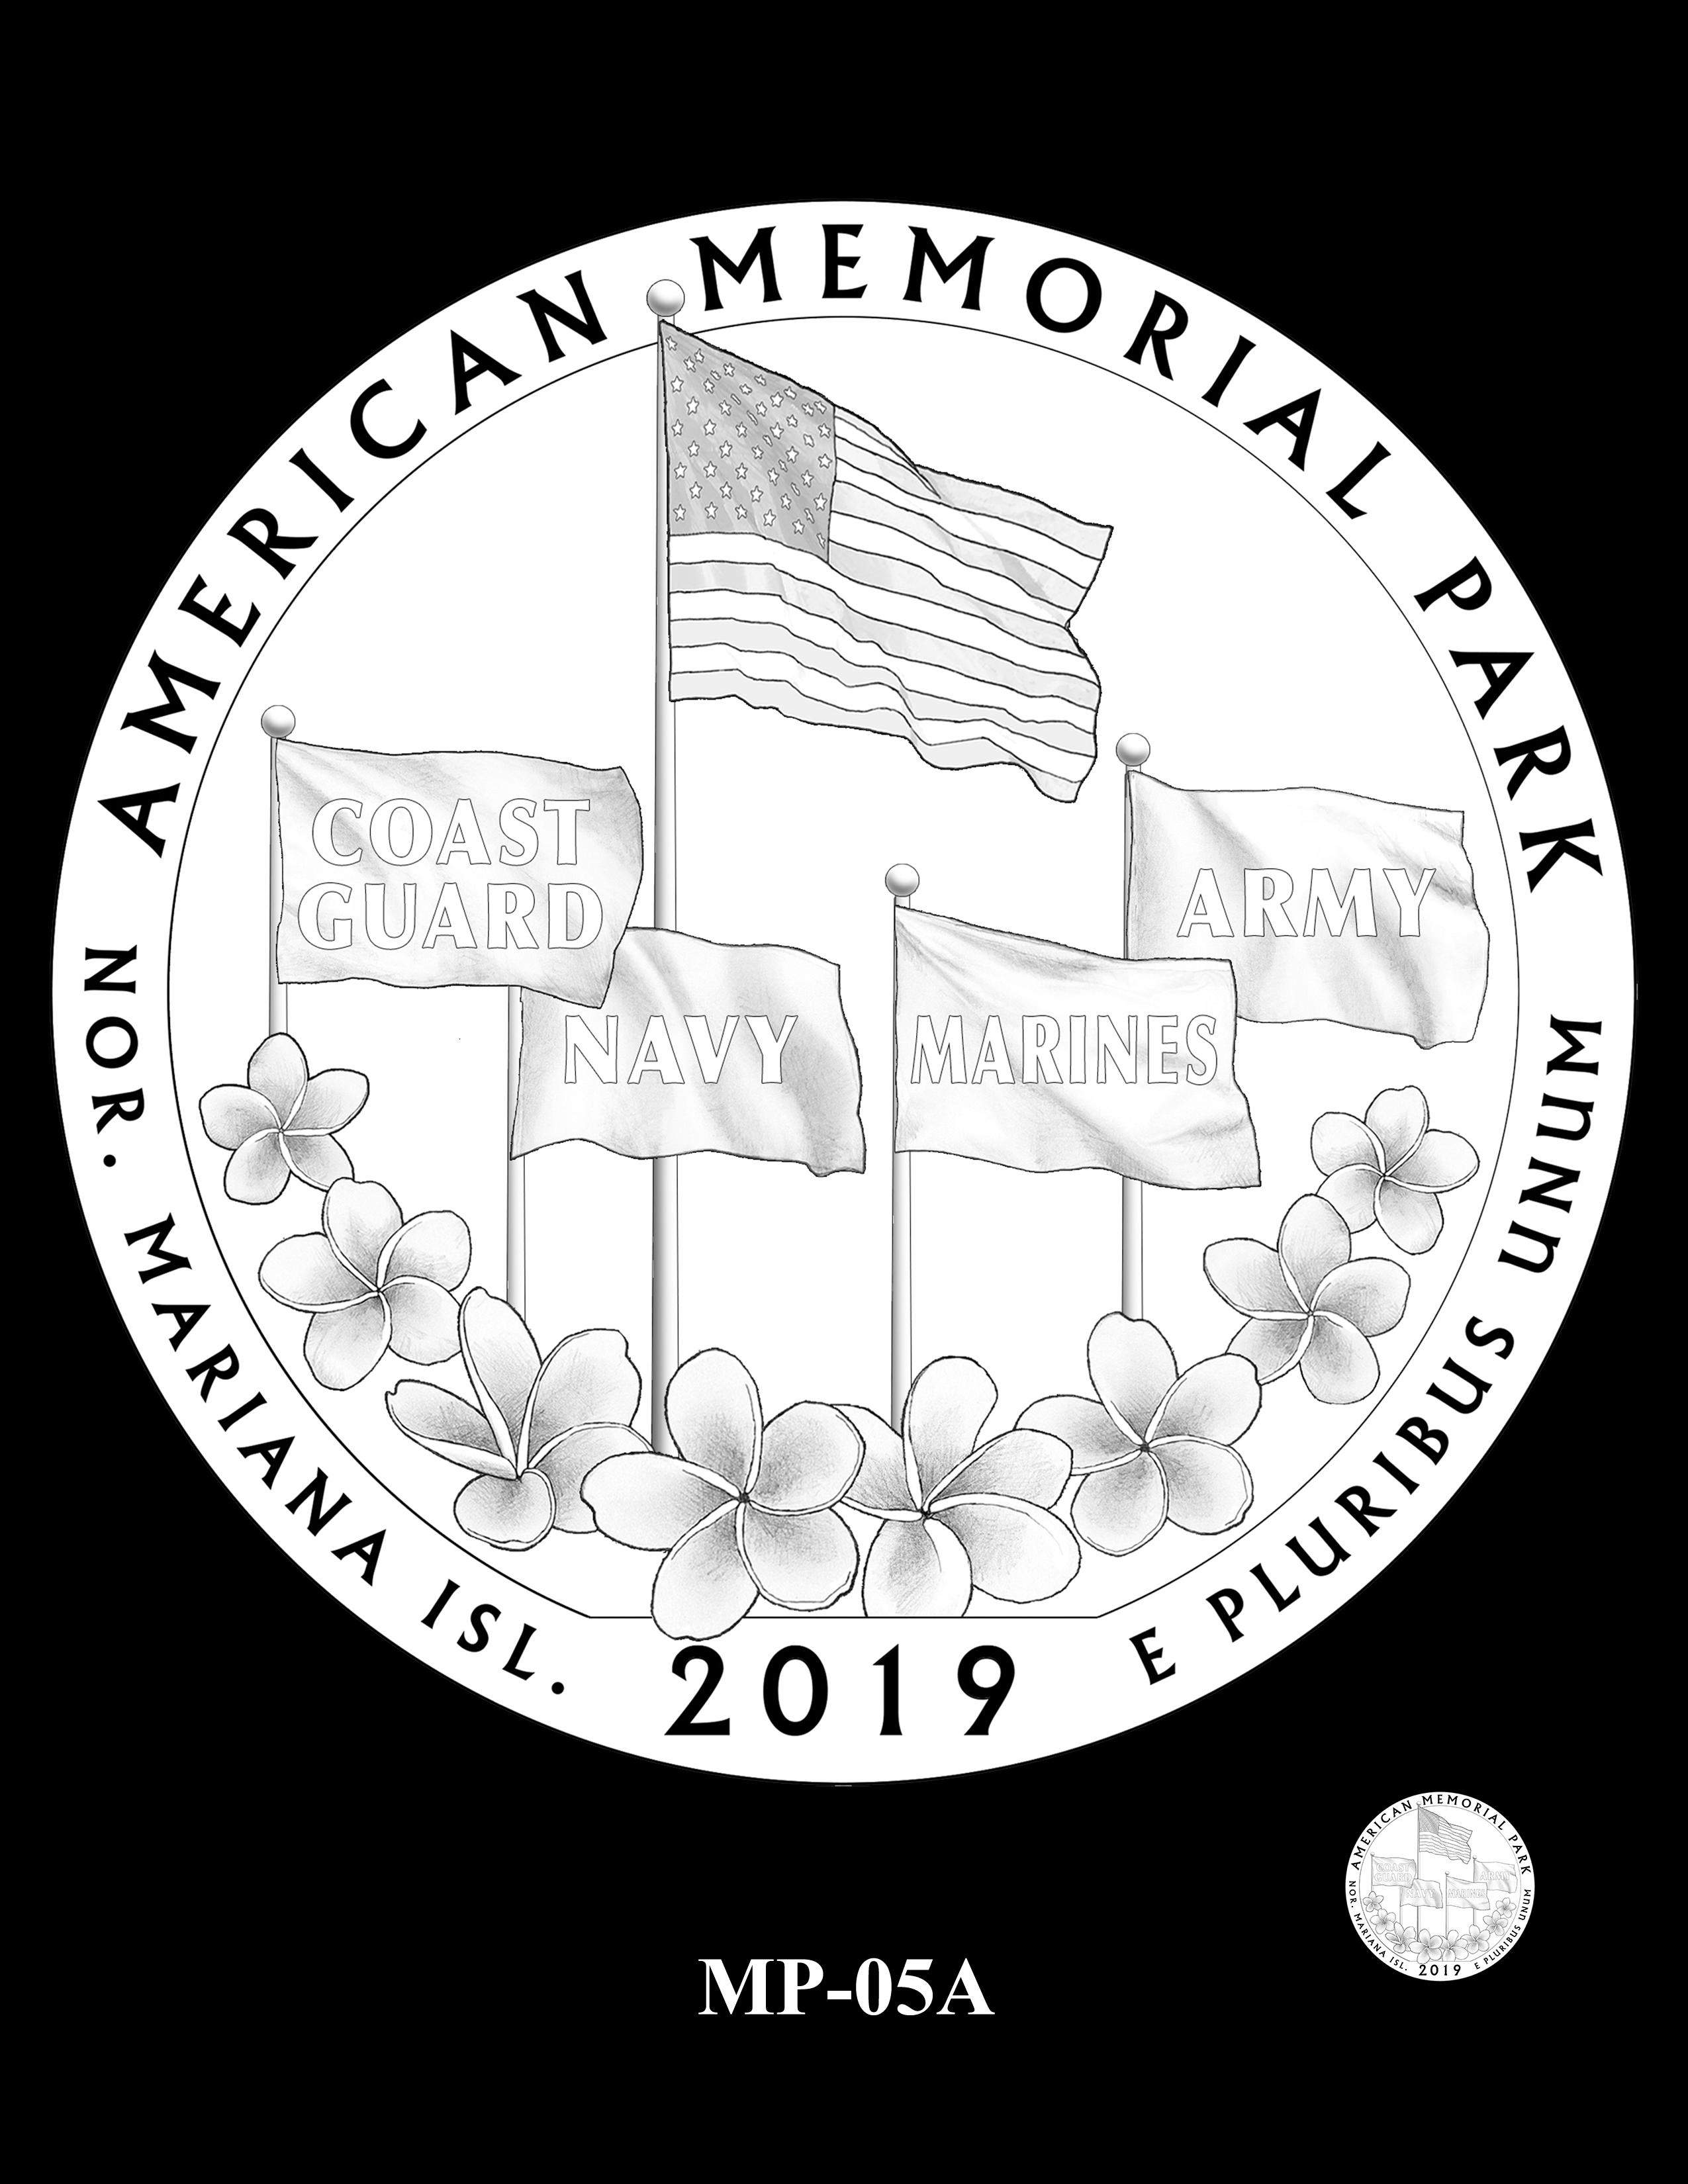 MP-05A -- 2019 America the Beautiful Quarters® Program